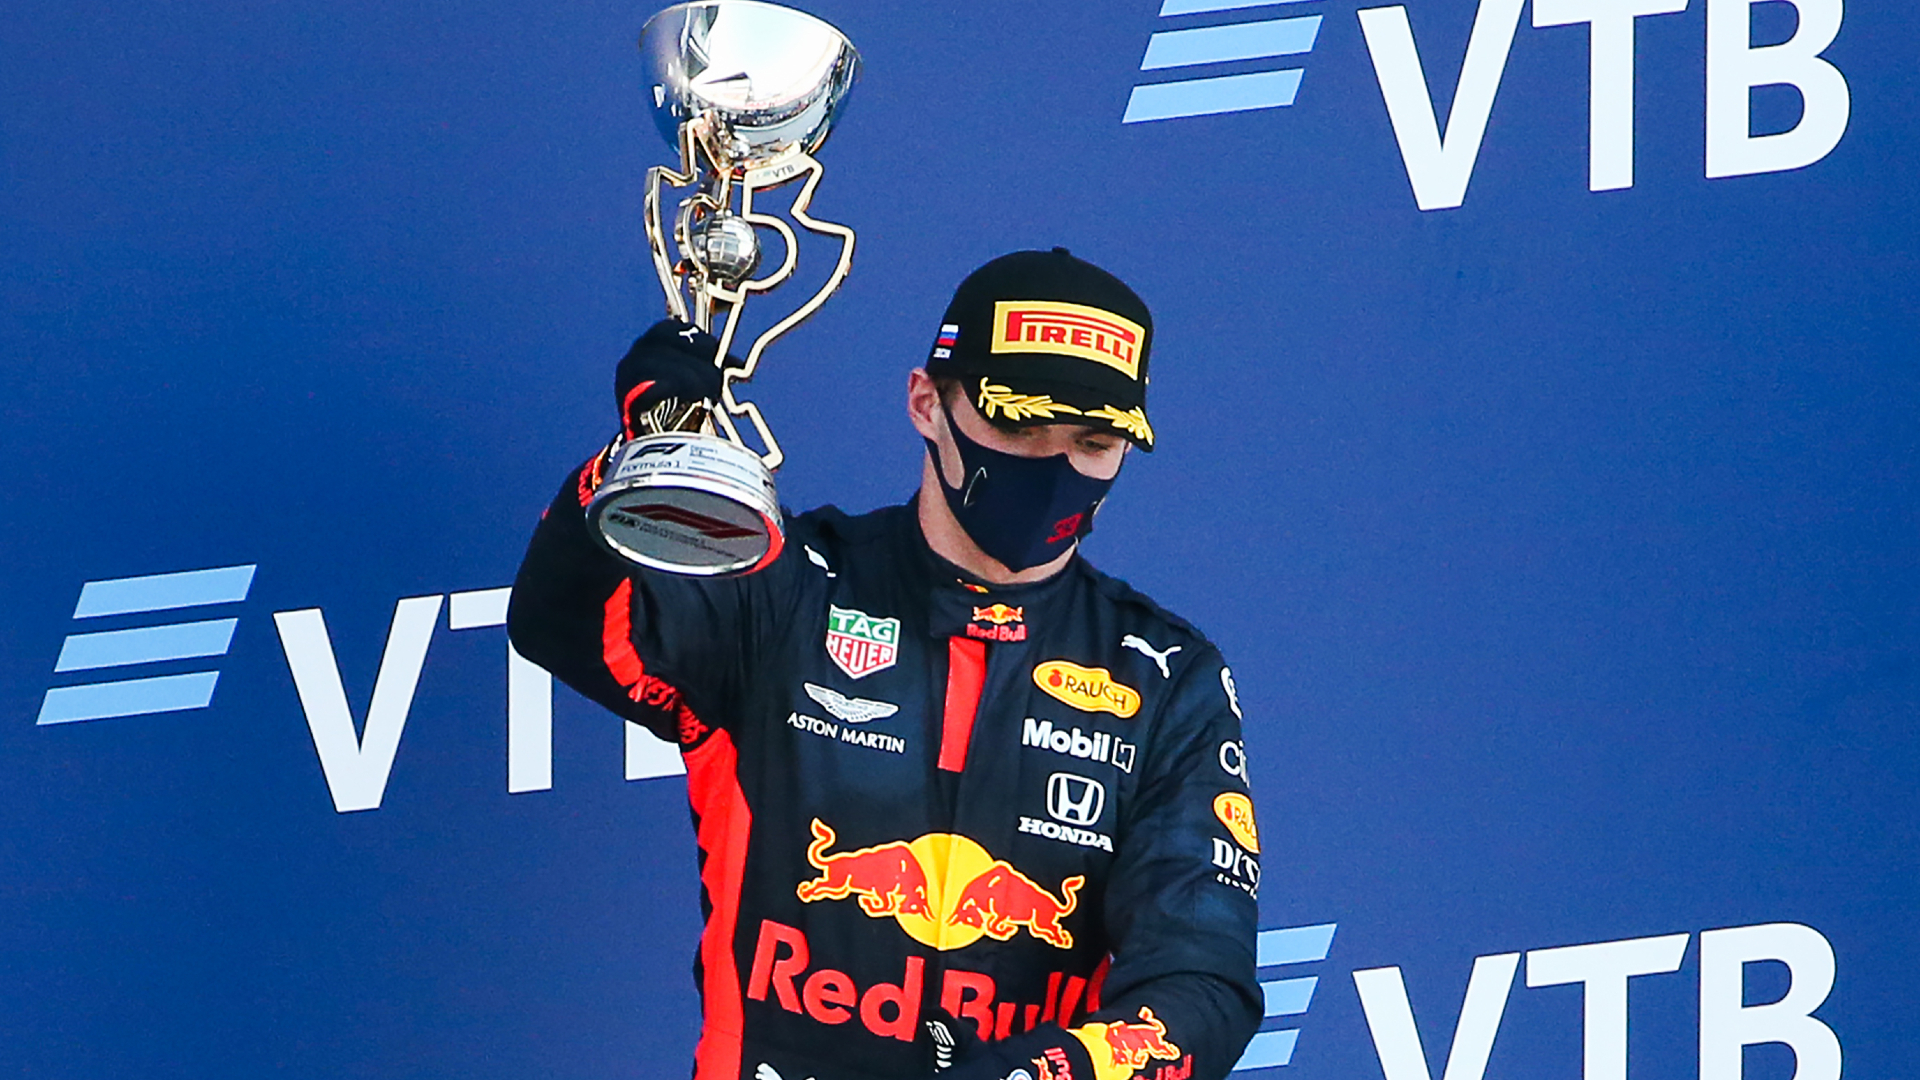 Verstappen committed to Red Bull despite engine concerns, says Horner